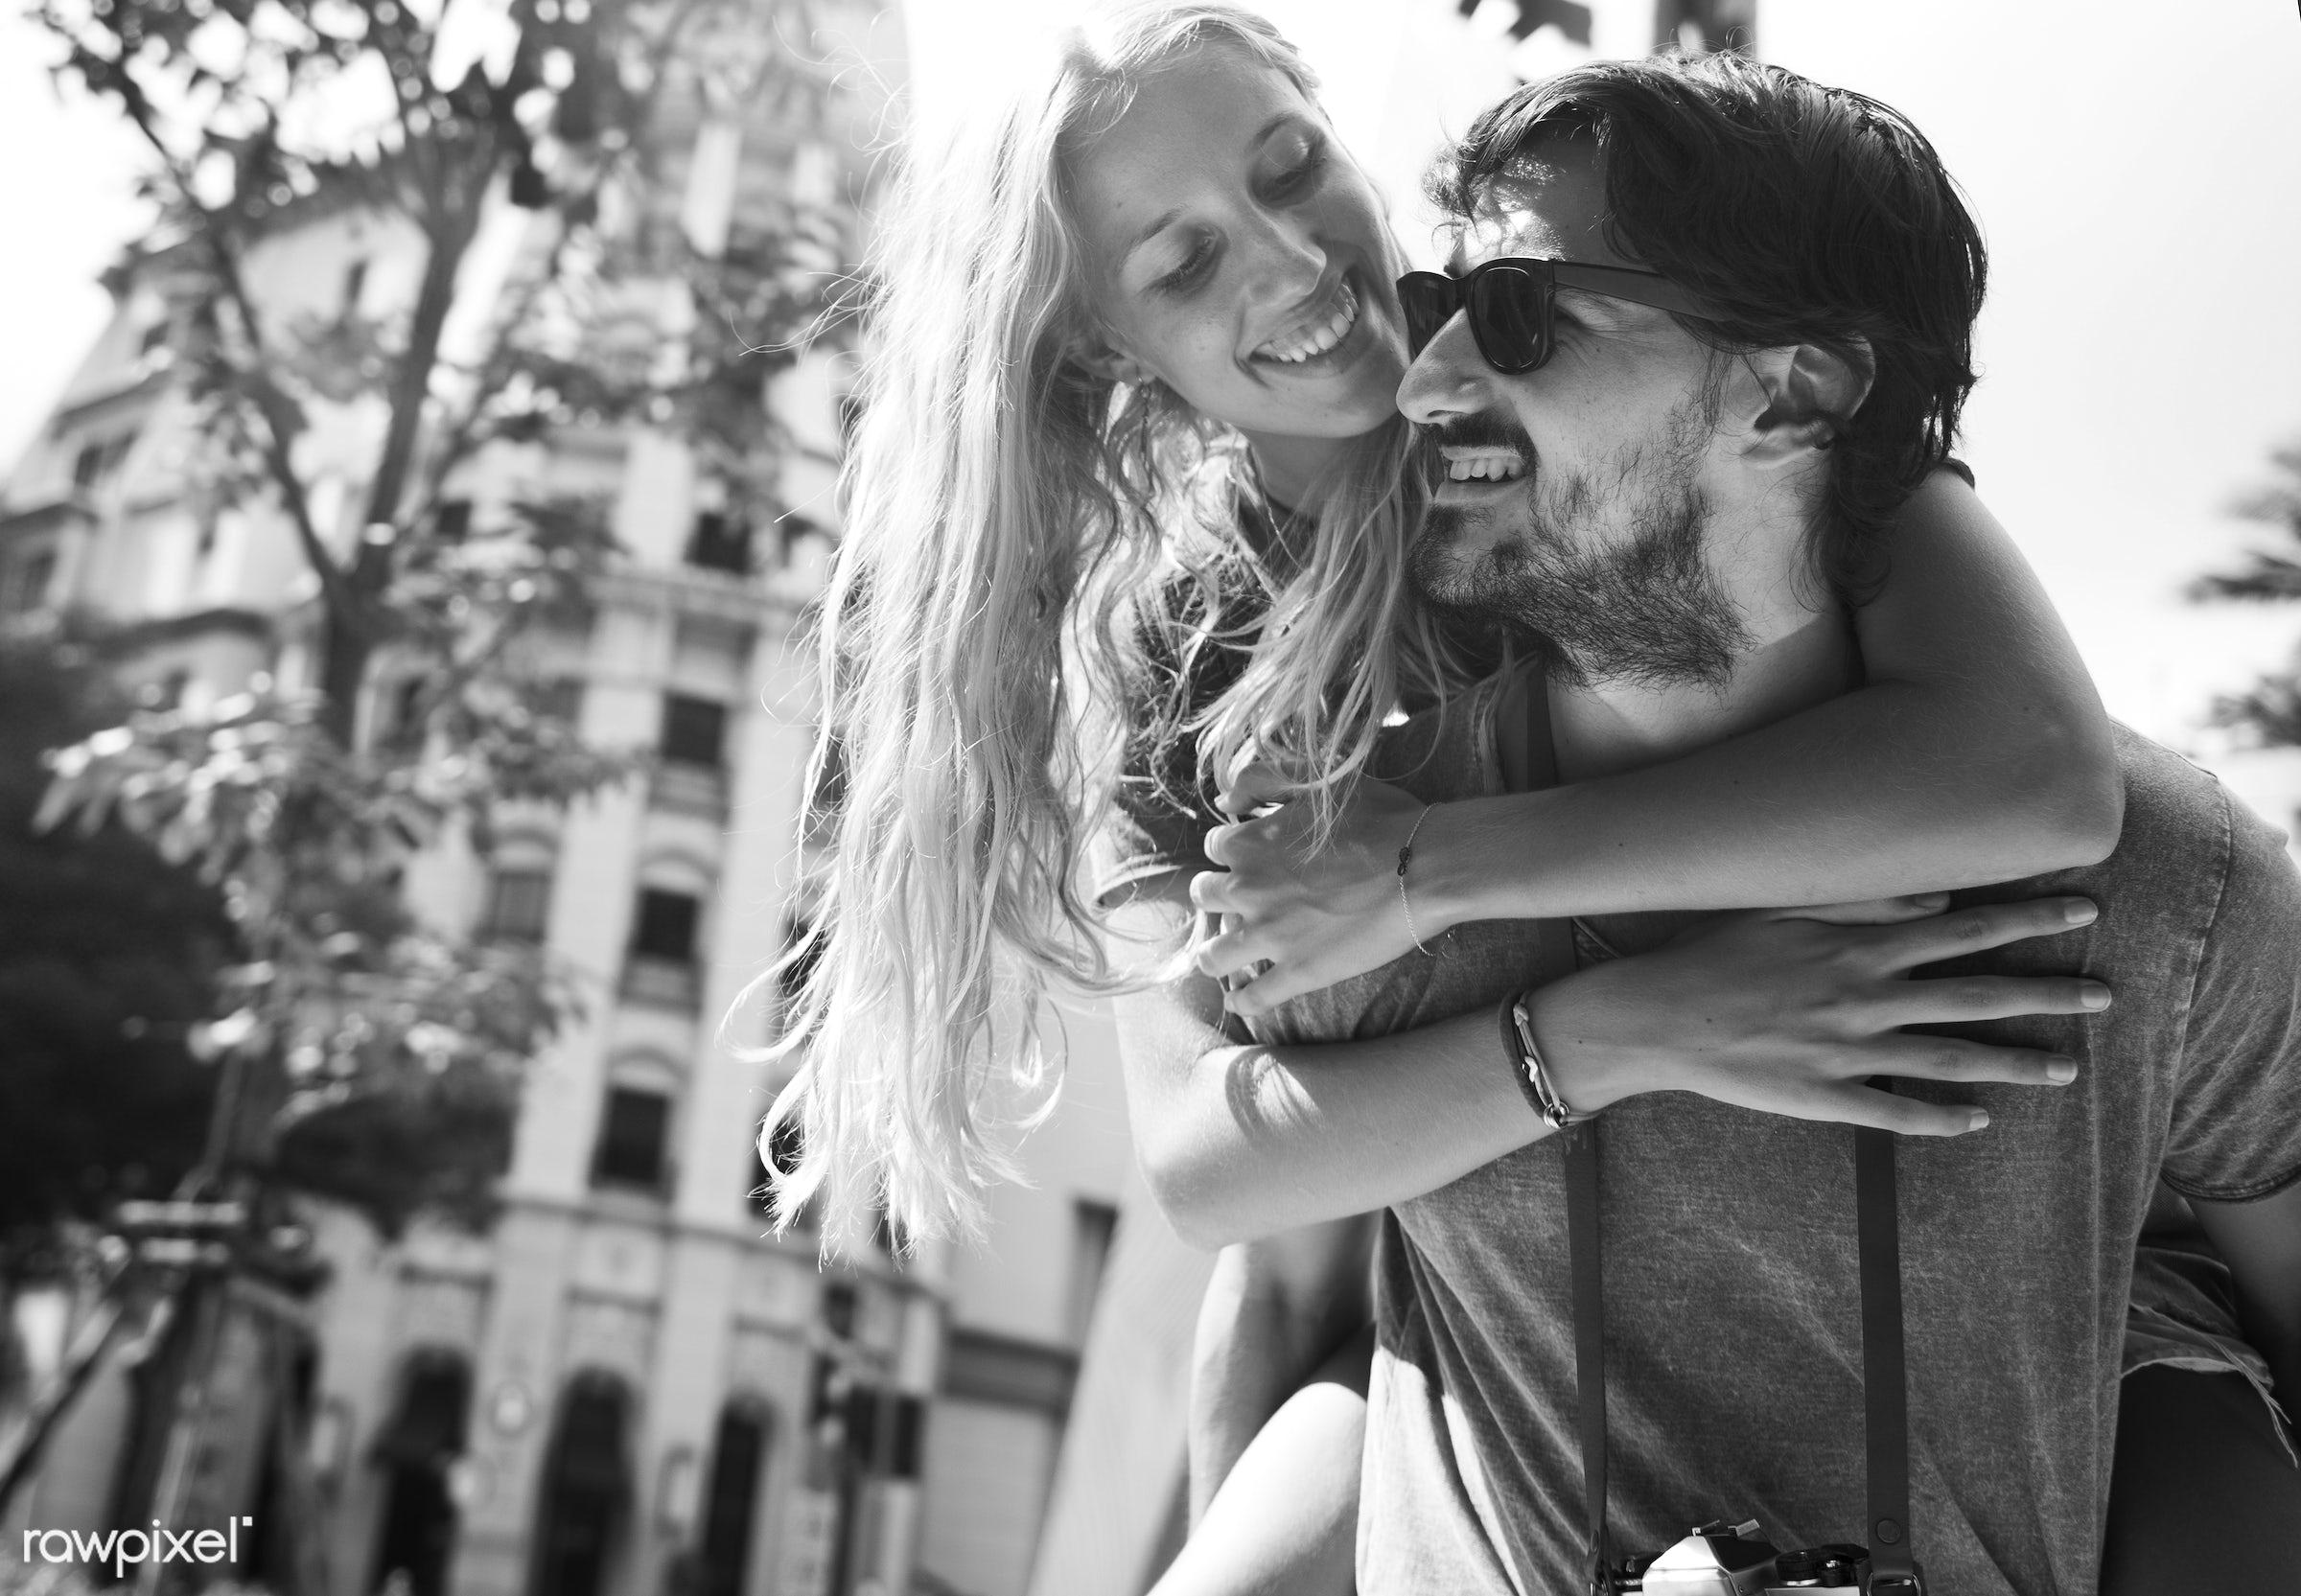 urban, adult, affection, beard, blonde, bonding, boyfriend, building, carrying, casual, caucasian, cheerful, city, couple,...